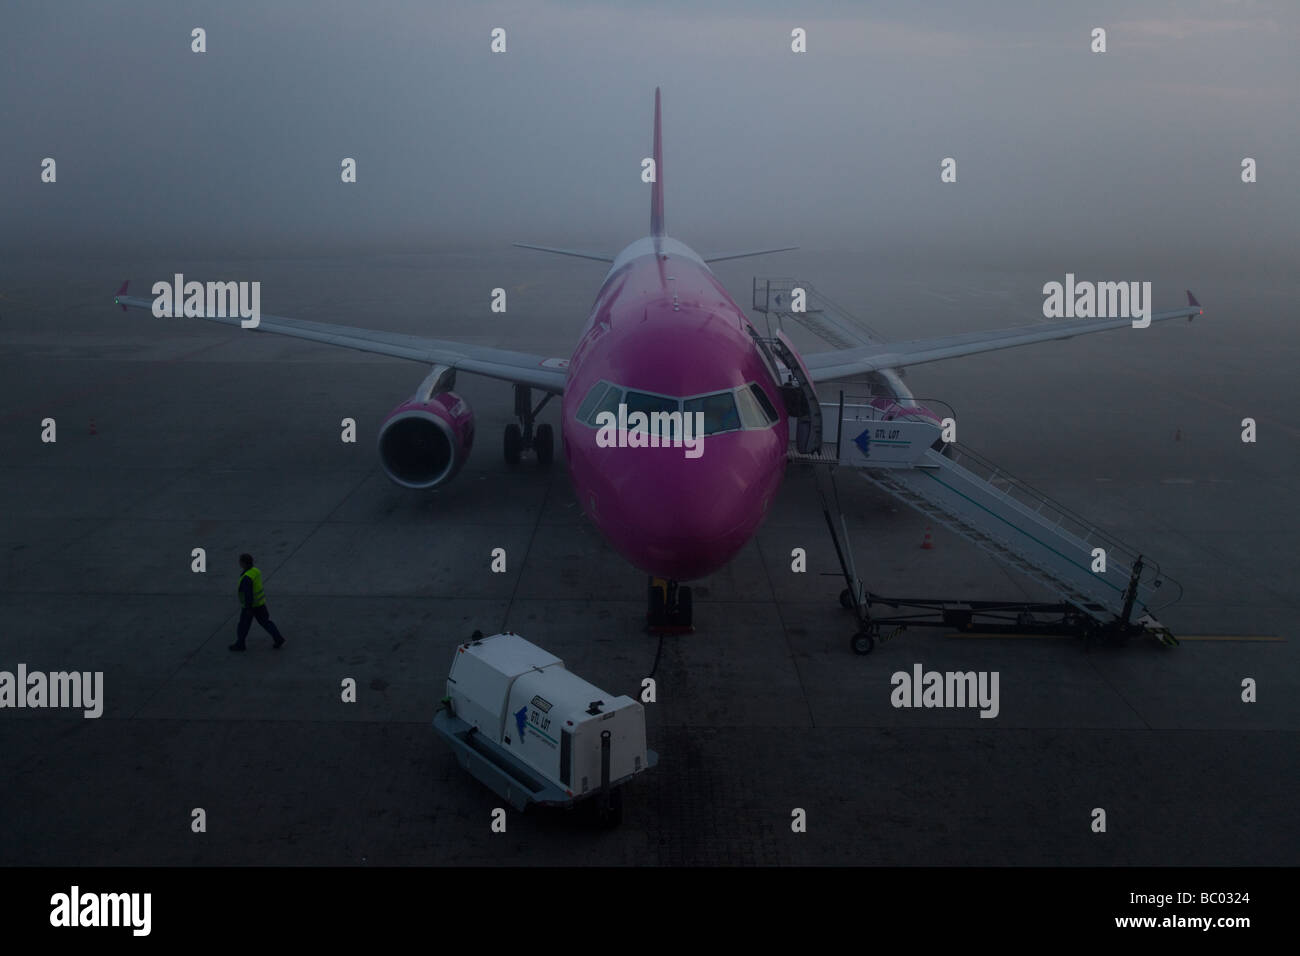 Delayed aeroplane in fog - Stock Image